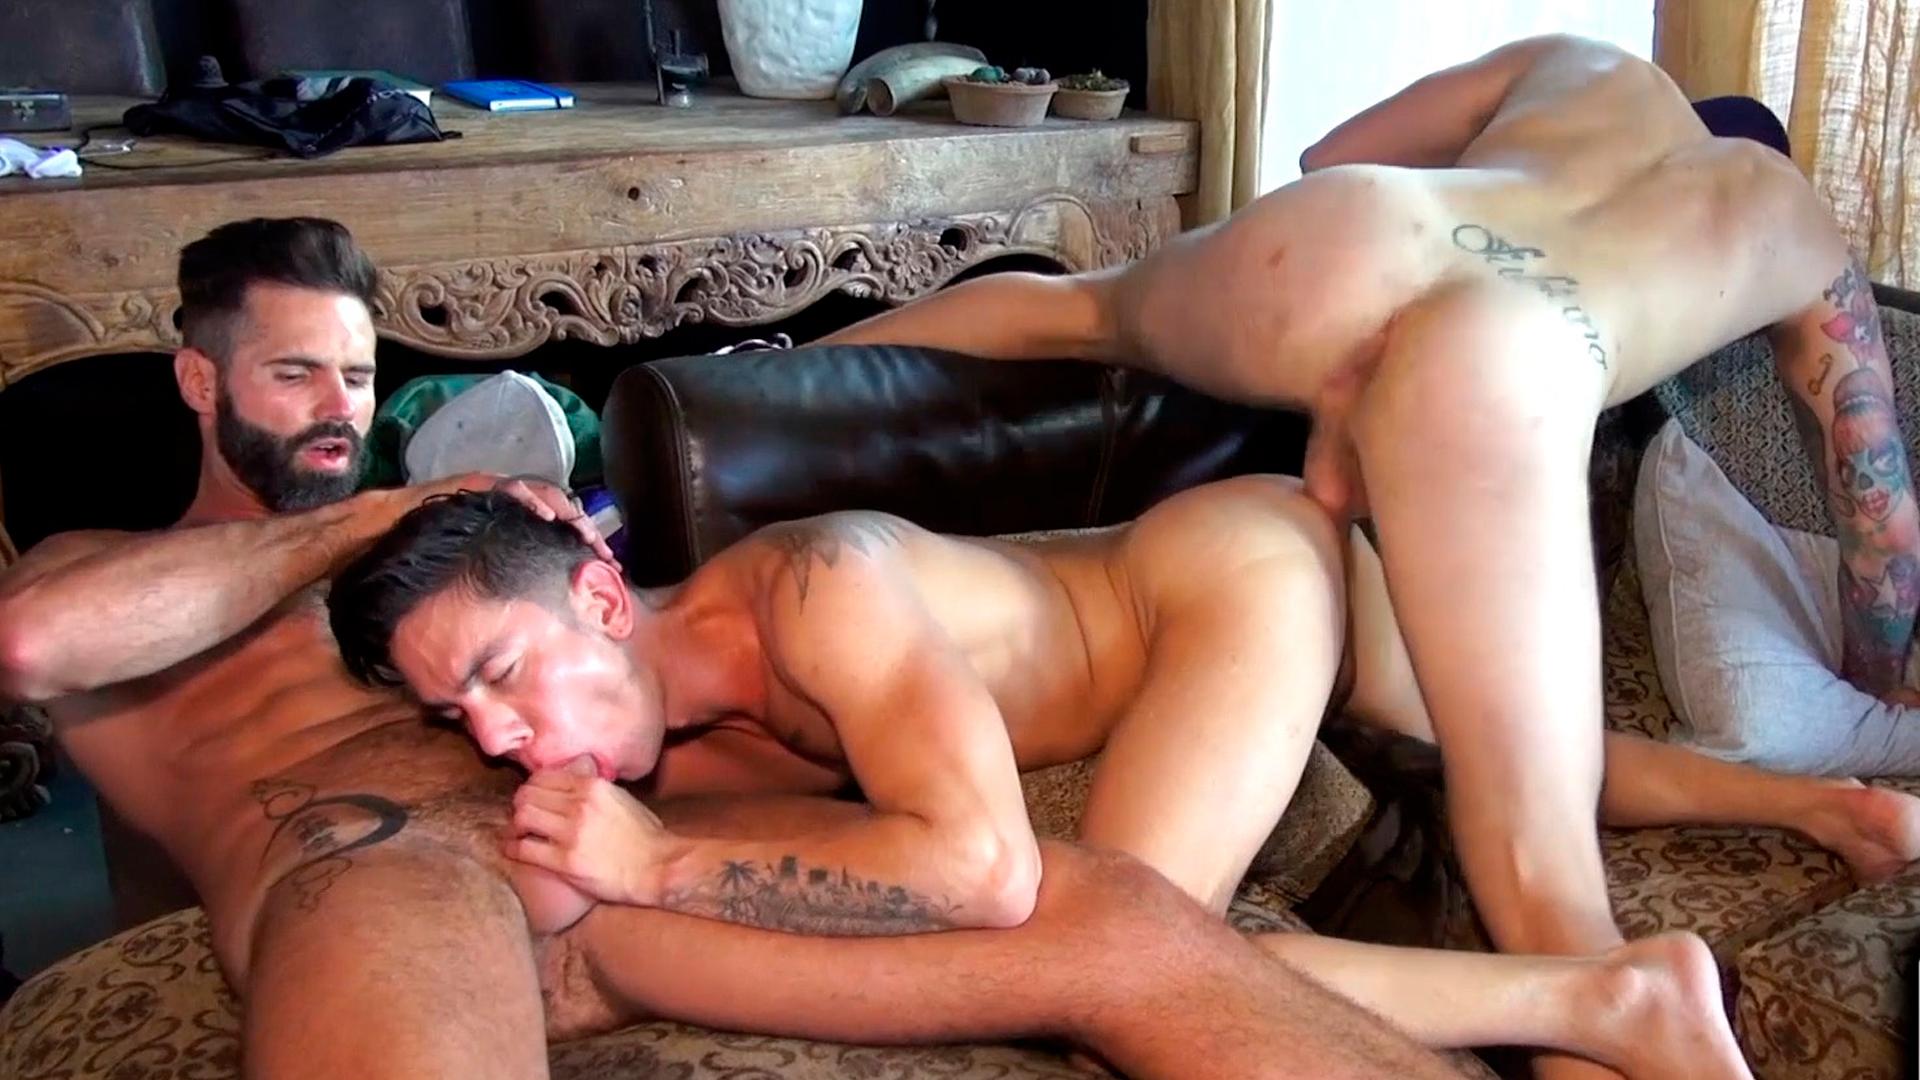 Eric Videos xxx twee meisjes met anale seks